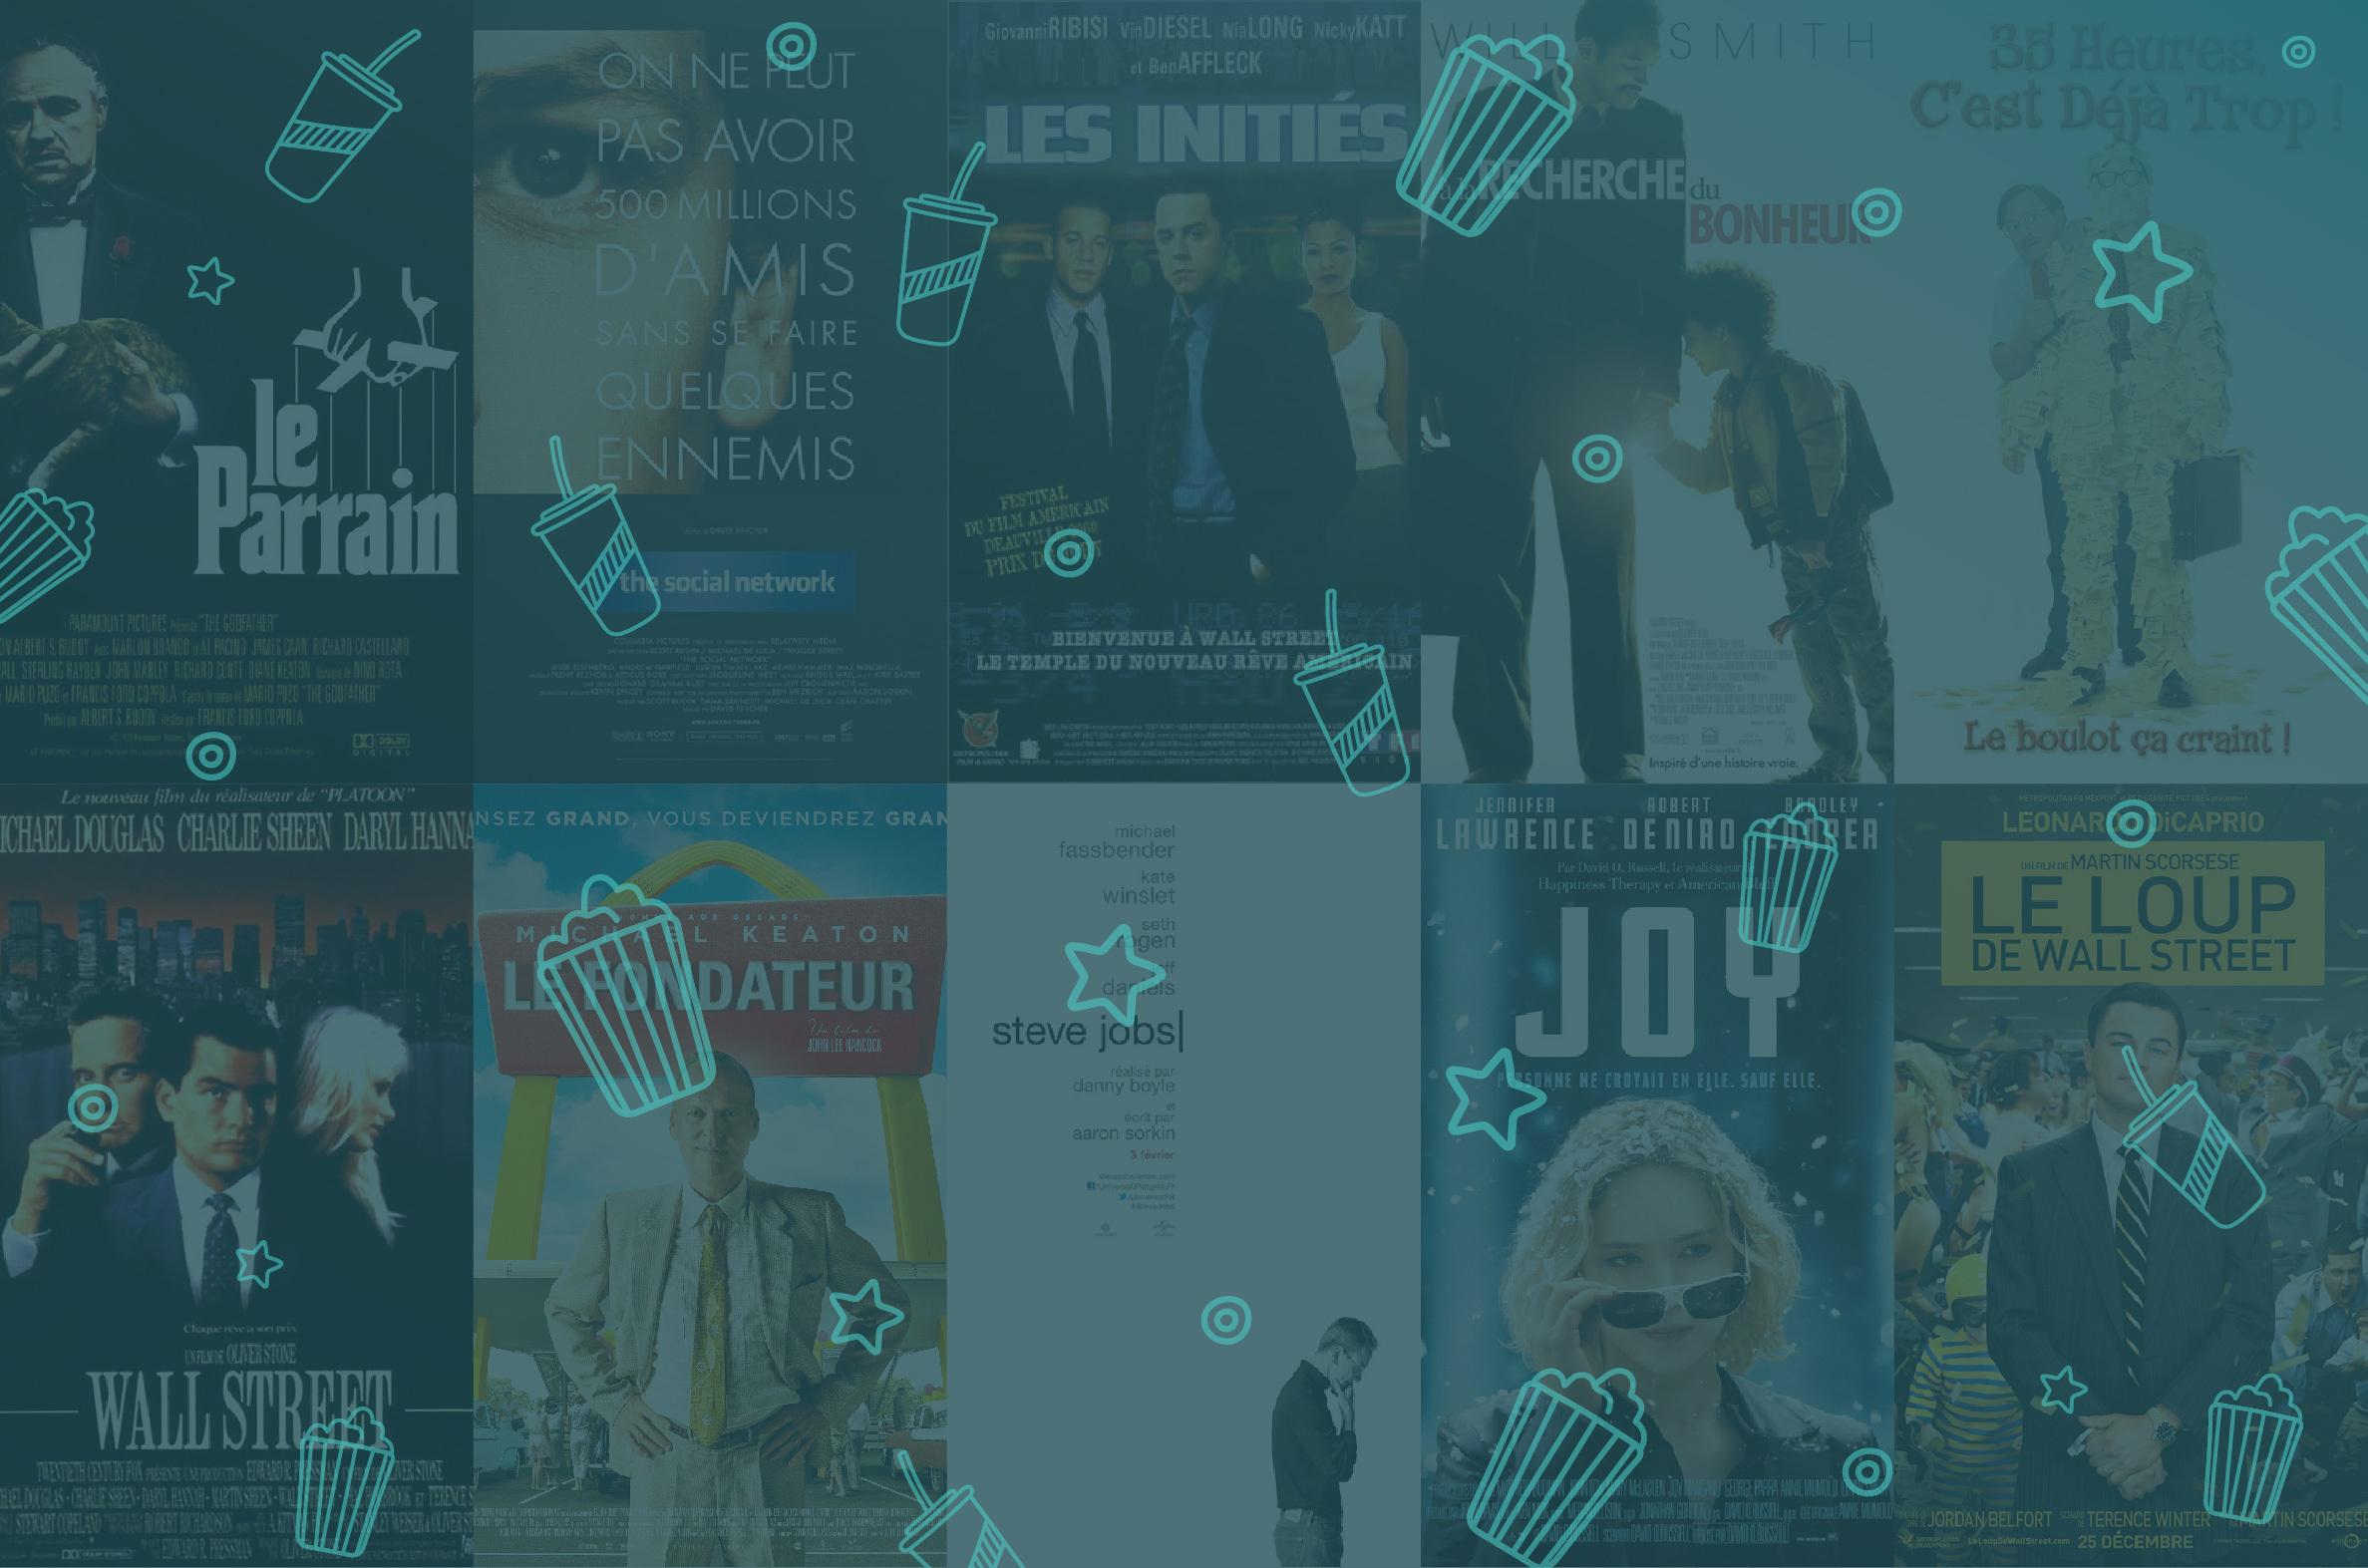 Business Attitude top 10 films